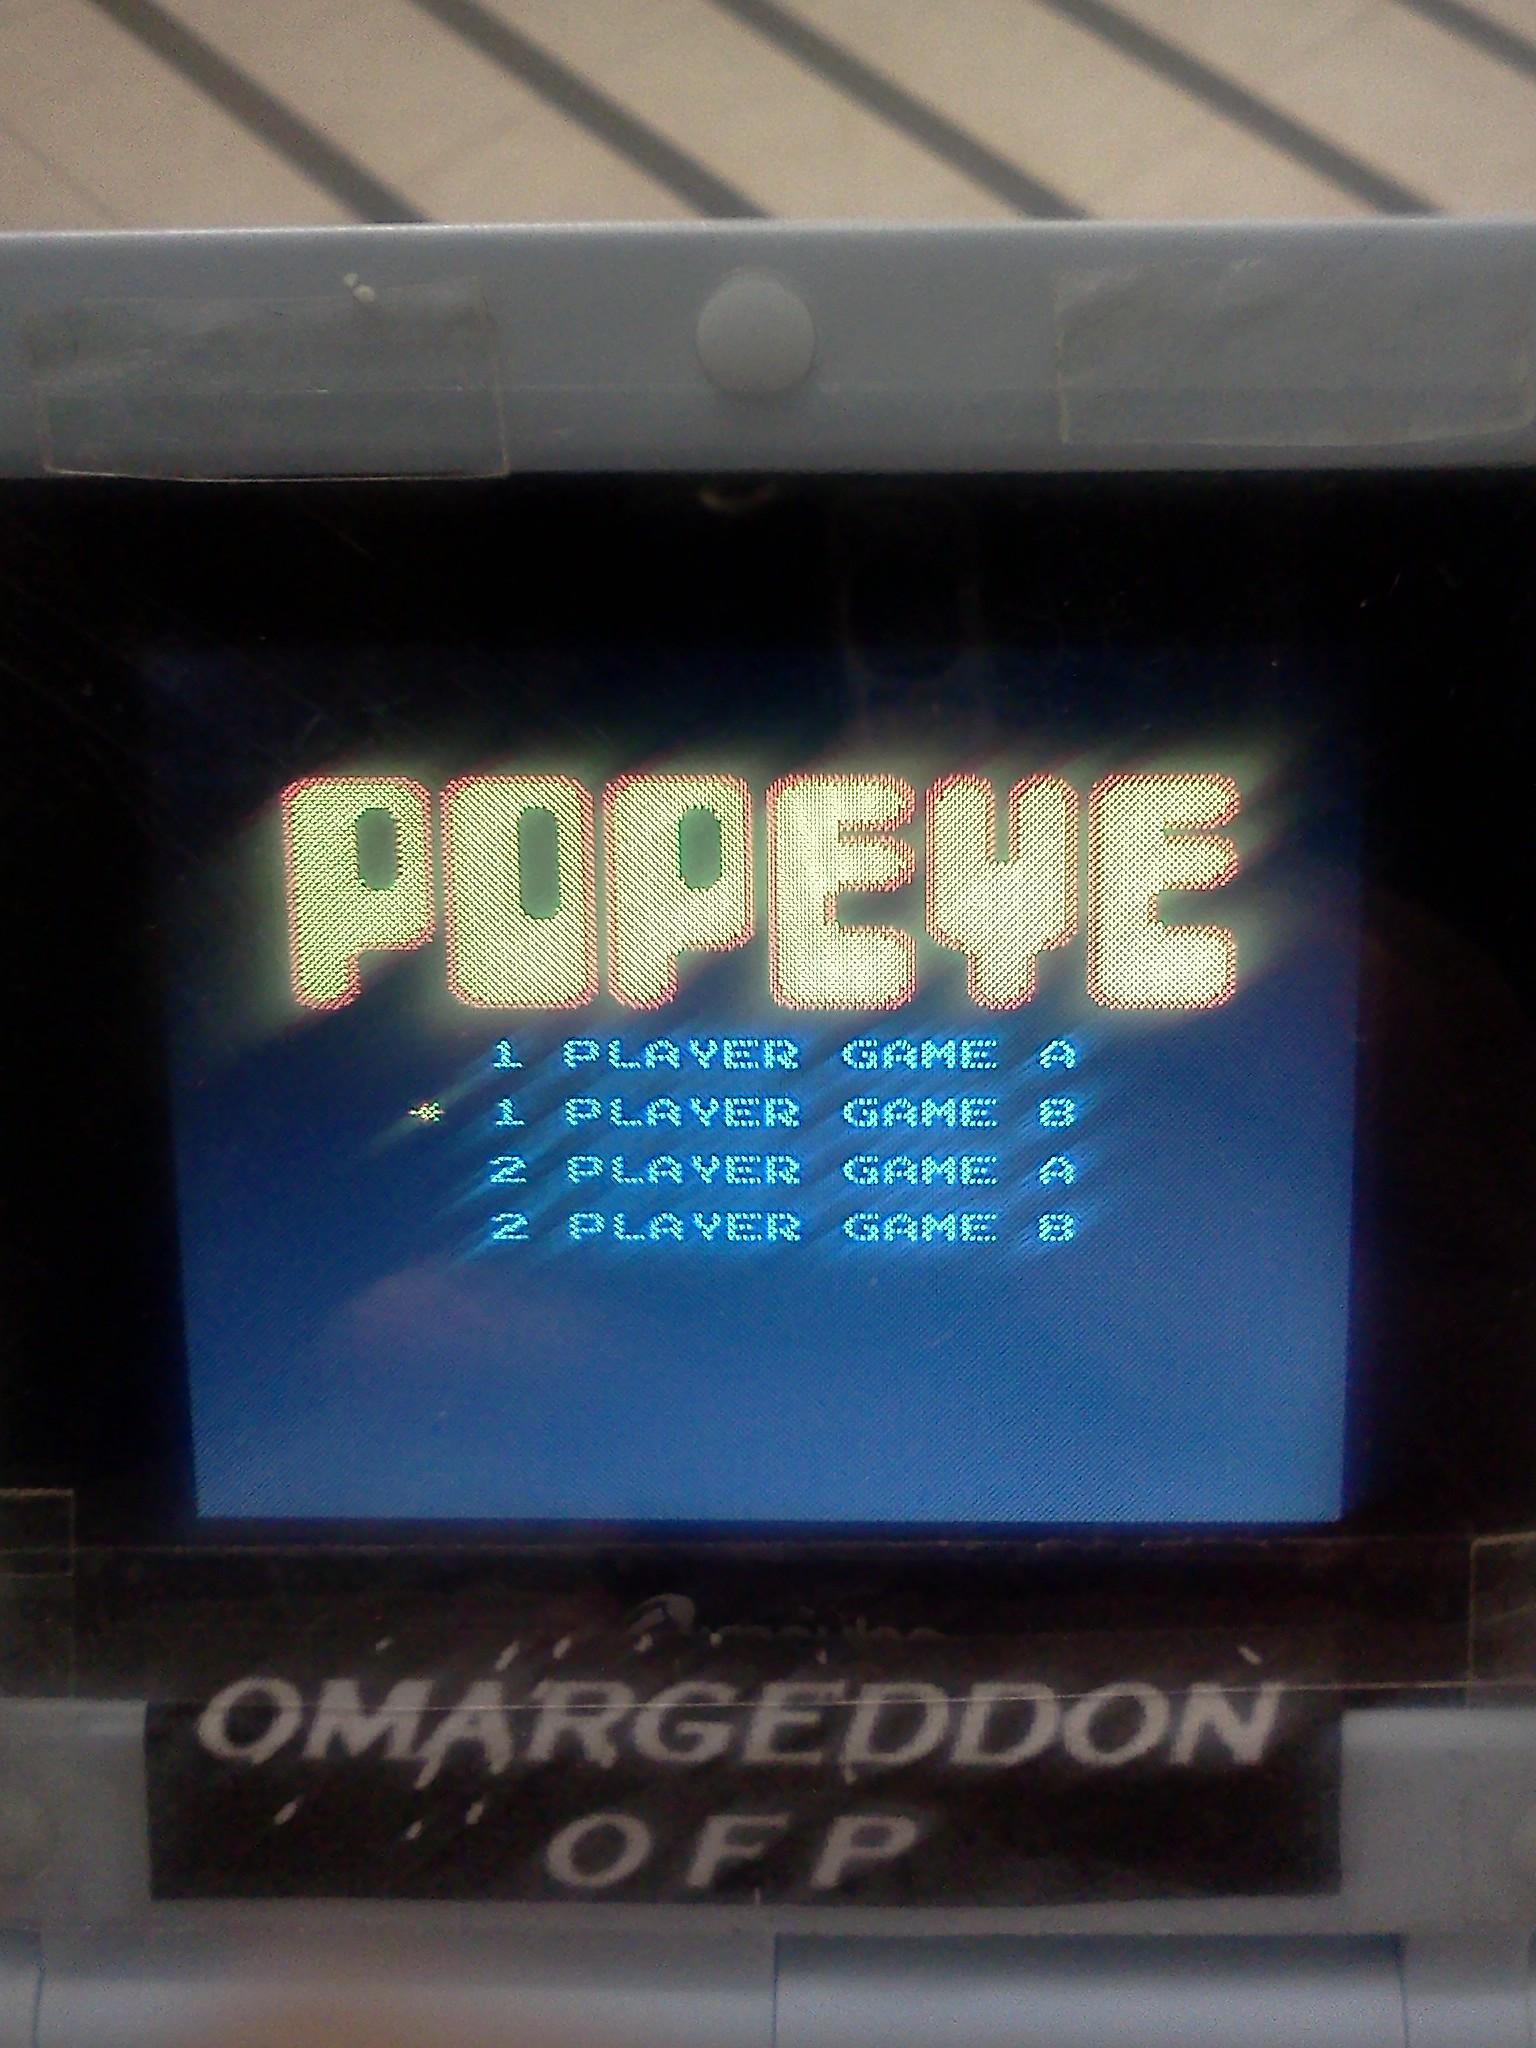 omargeddon: Popeye: Game B (NES/Famicom Emulated) 75,200 points on 2016-08-26 19:49:54